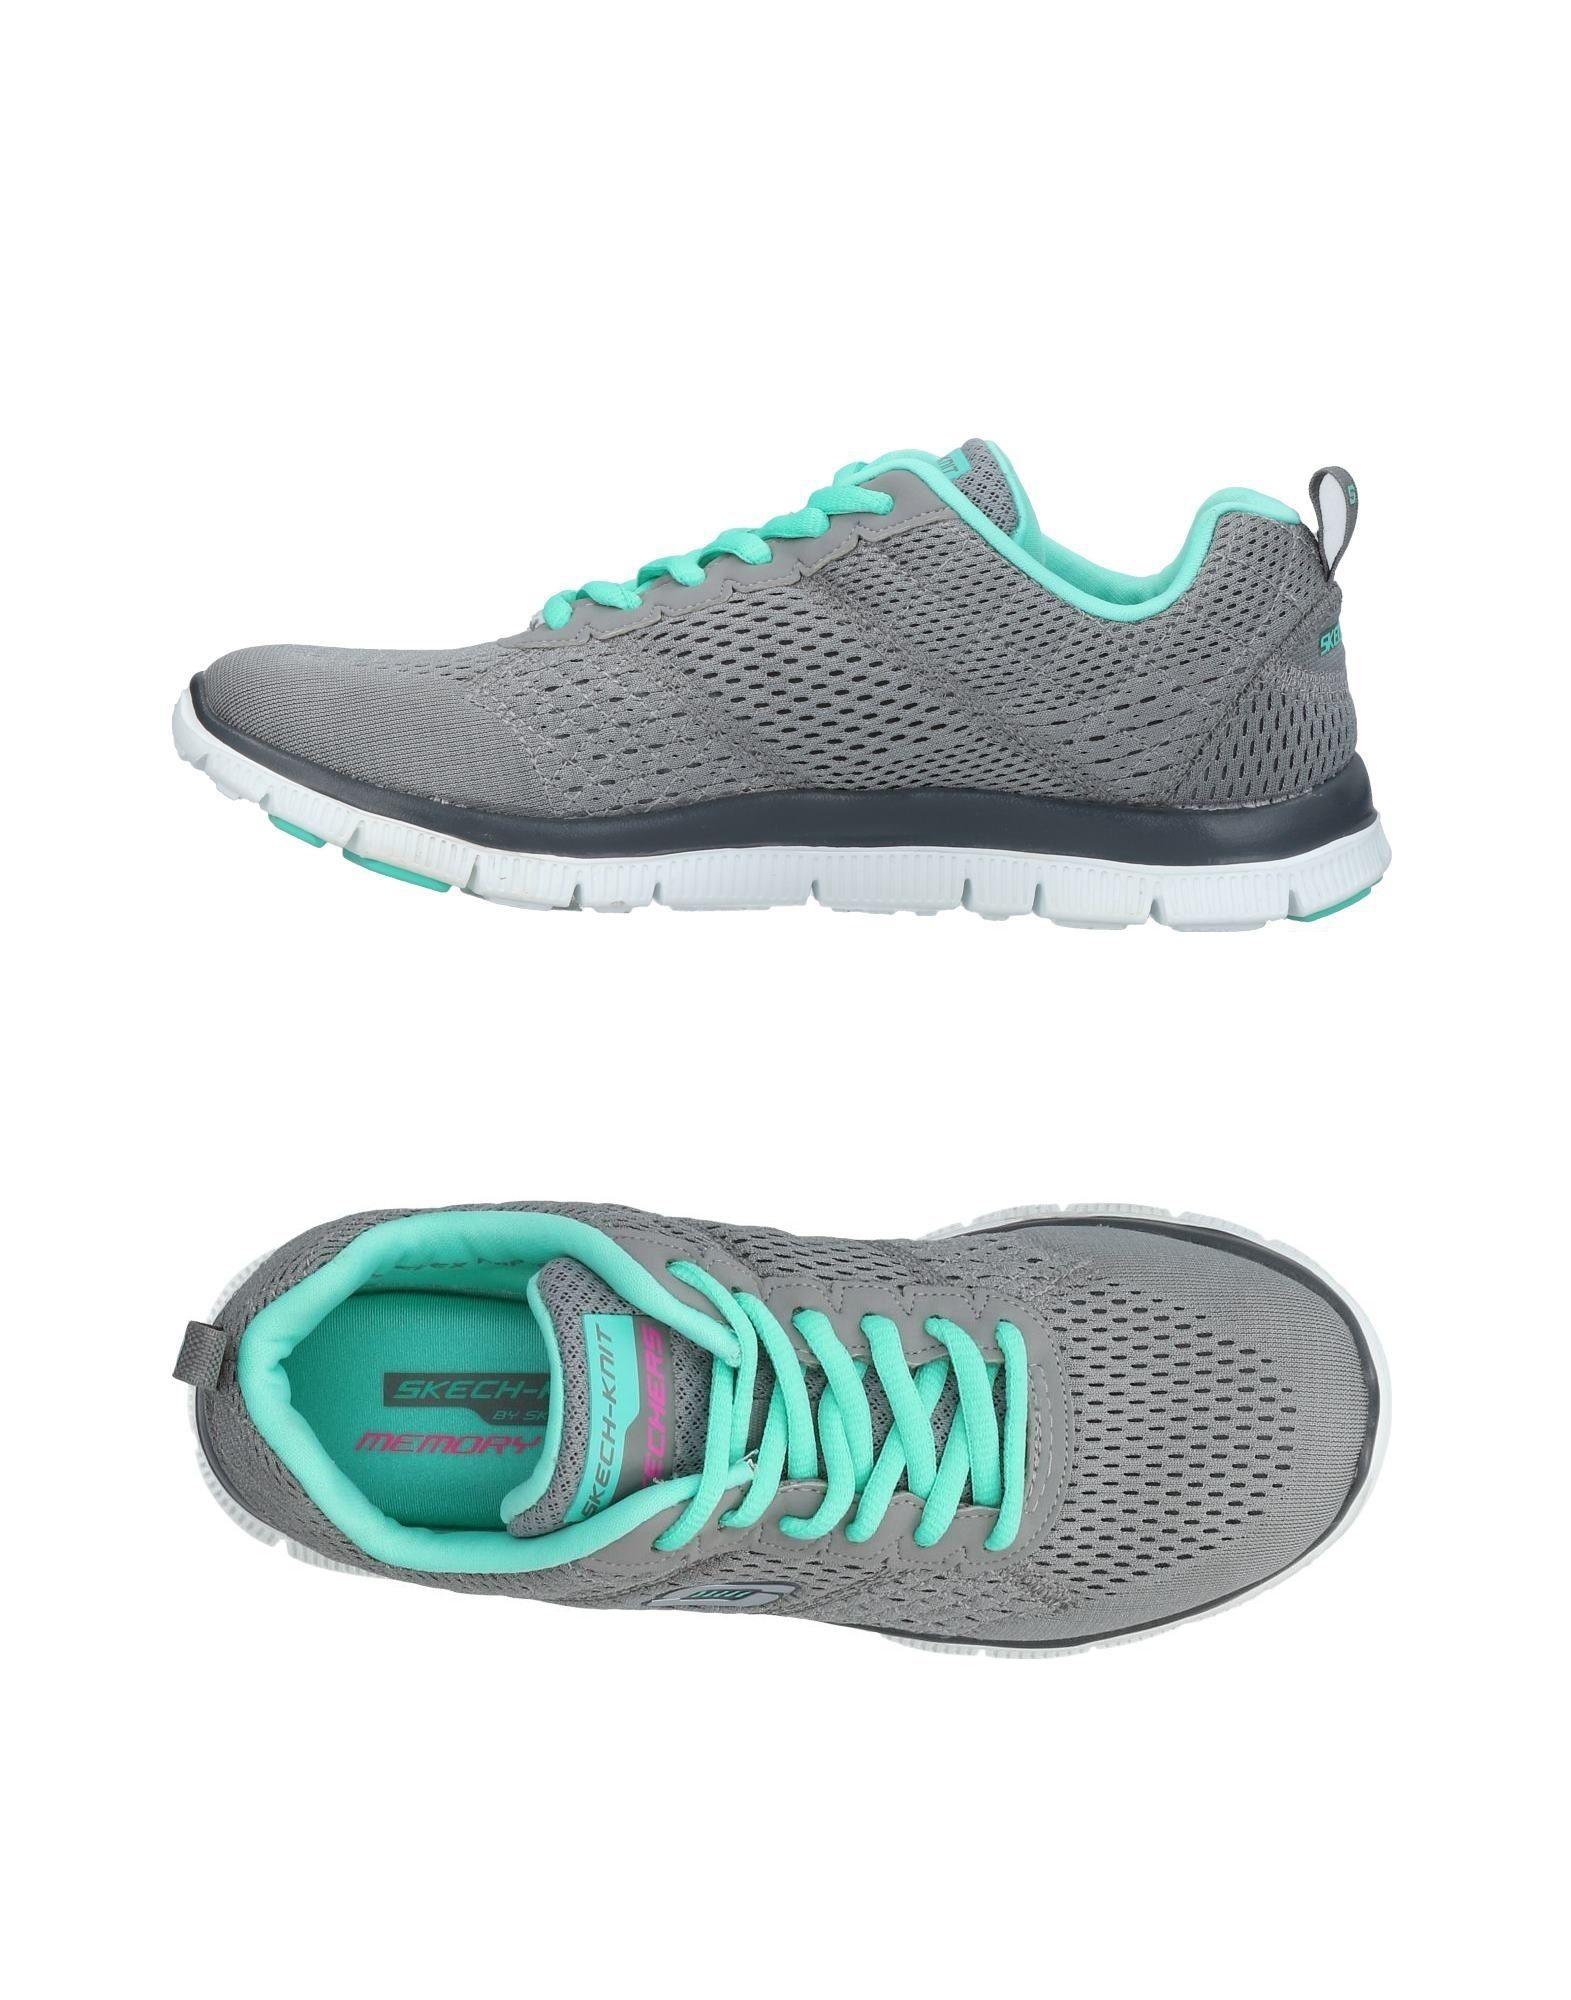 Skechers Sneakers Damen  11229387IX Gute Qualität beliebte Schuhe